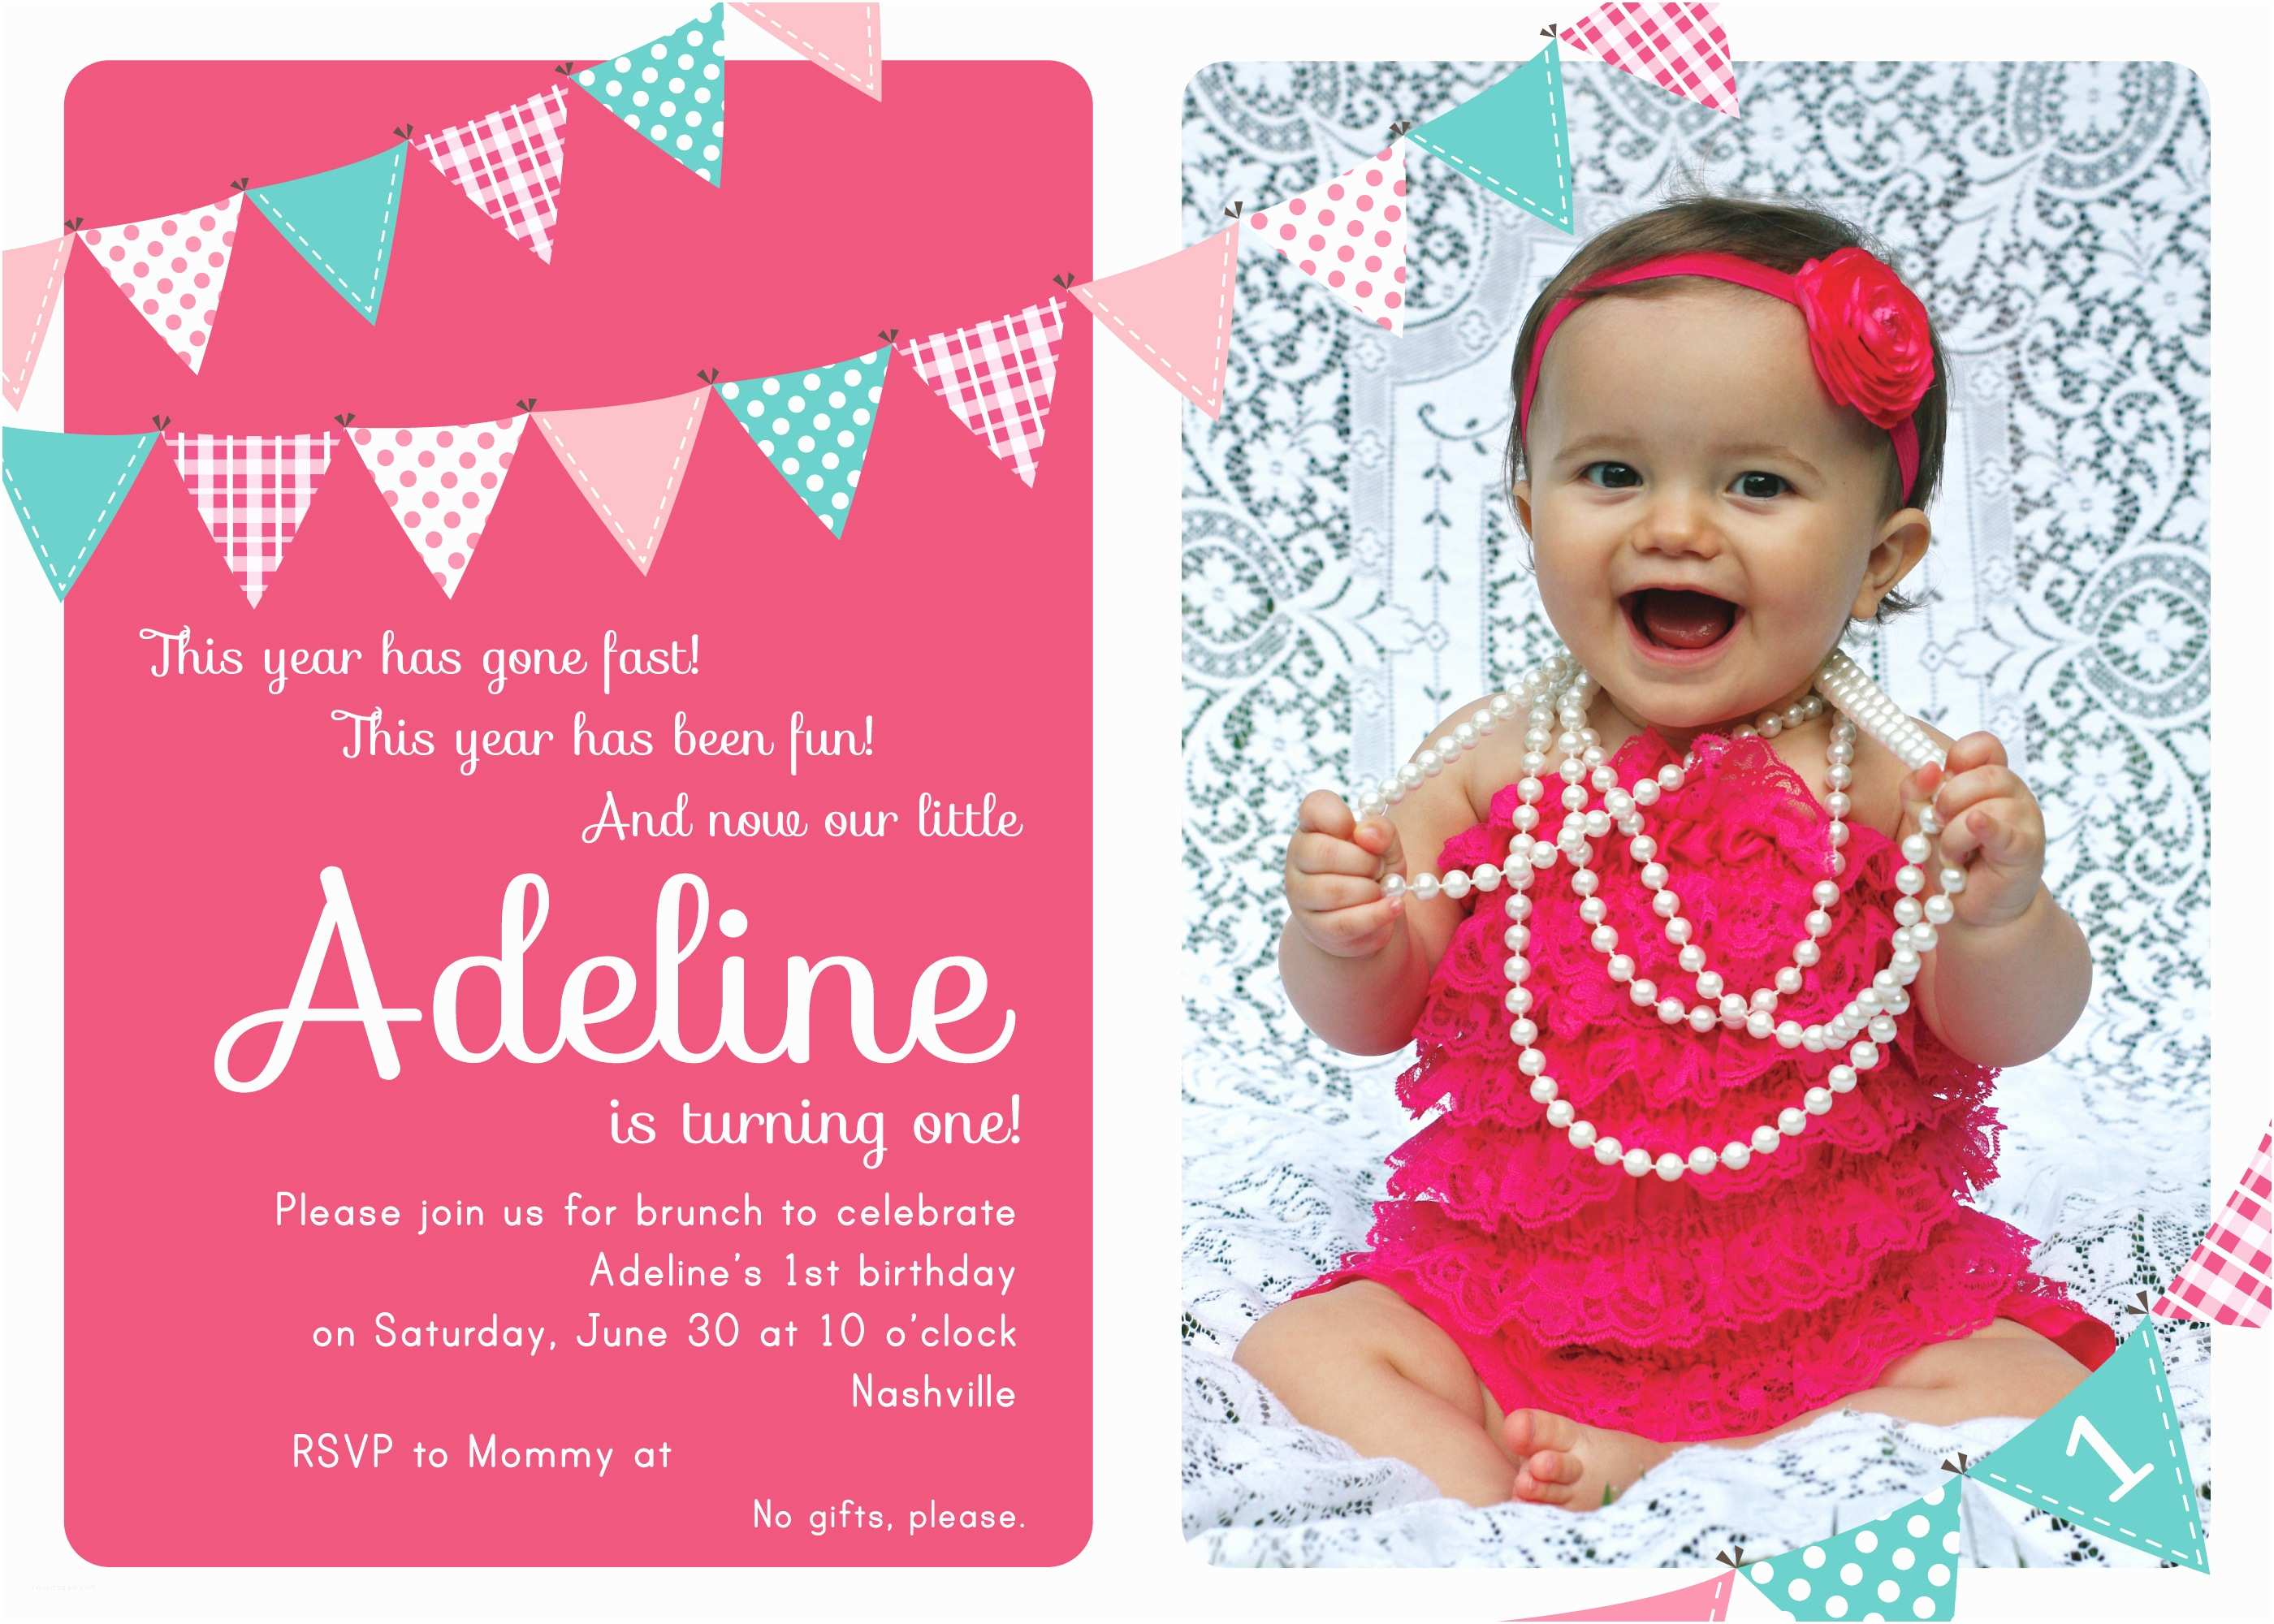 Girls Birthday Party Invitations Baby Girl's 1st Birthday Invitation Cards Ideas